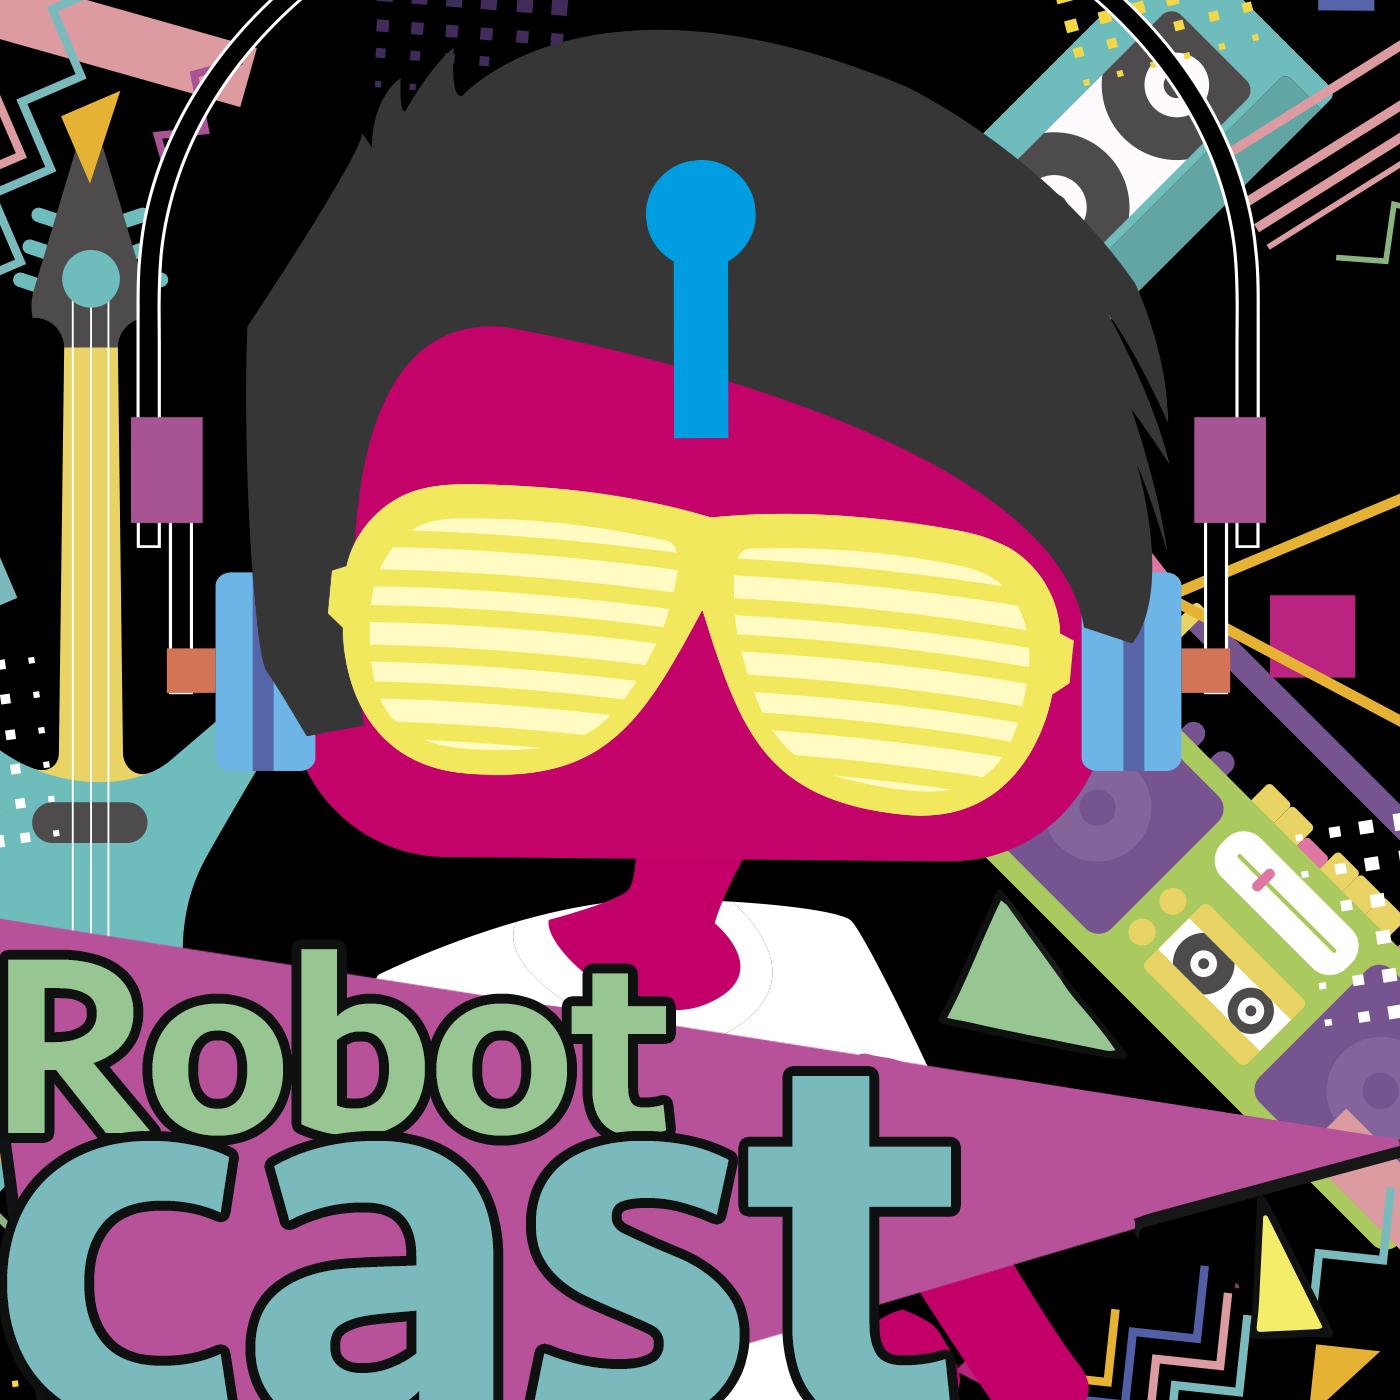 RobotCast